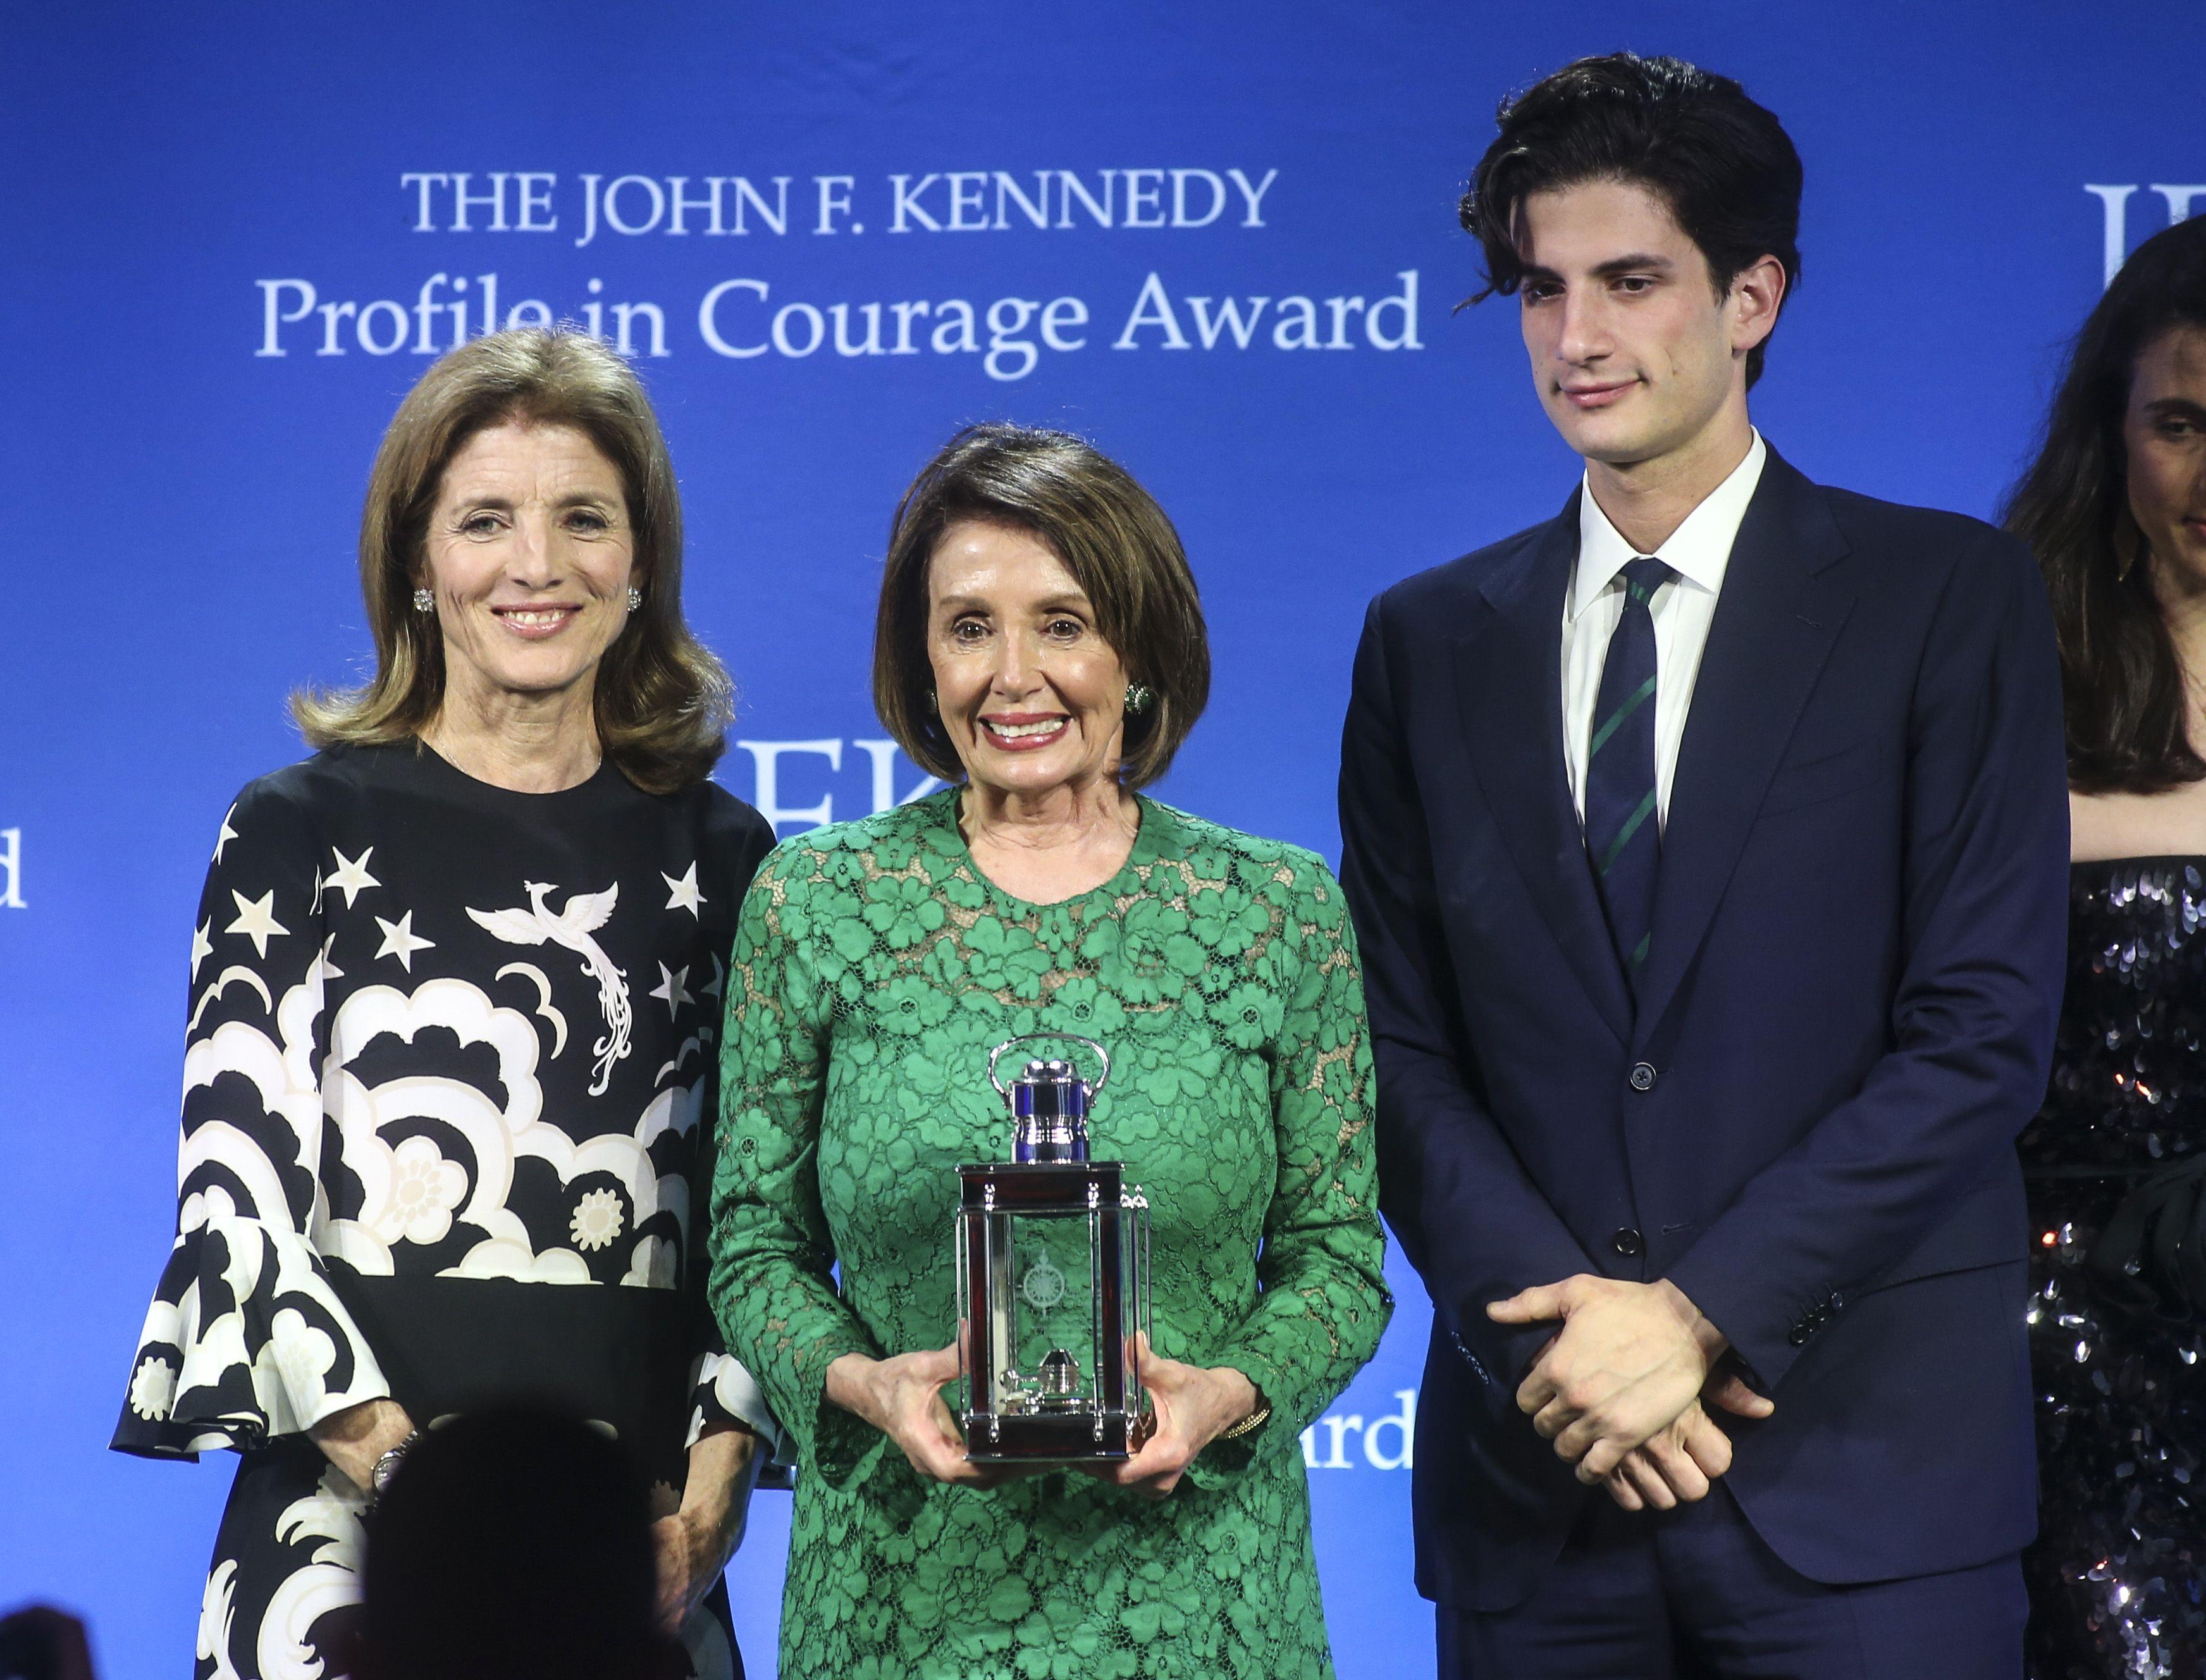 Caroline Kennedy Just Gave Nancy Pelosi The Cutest Compliment